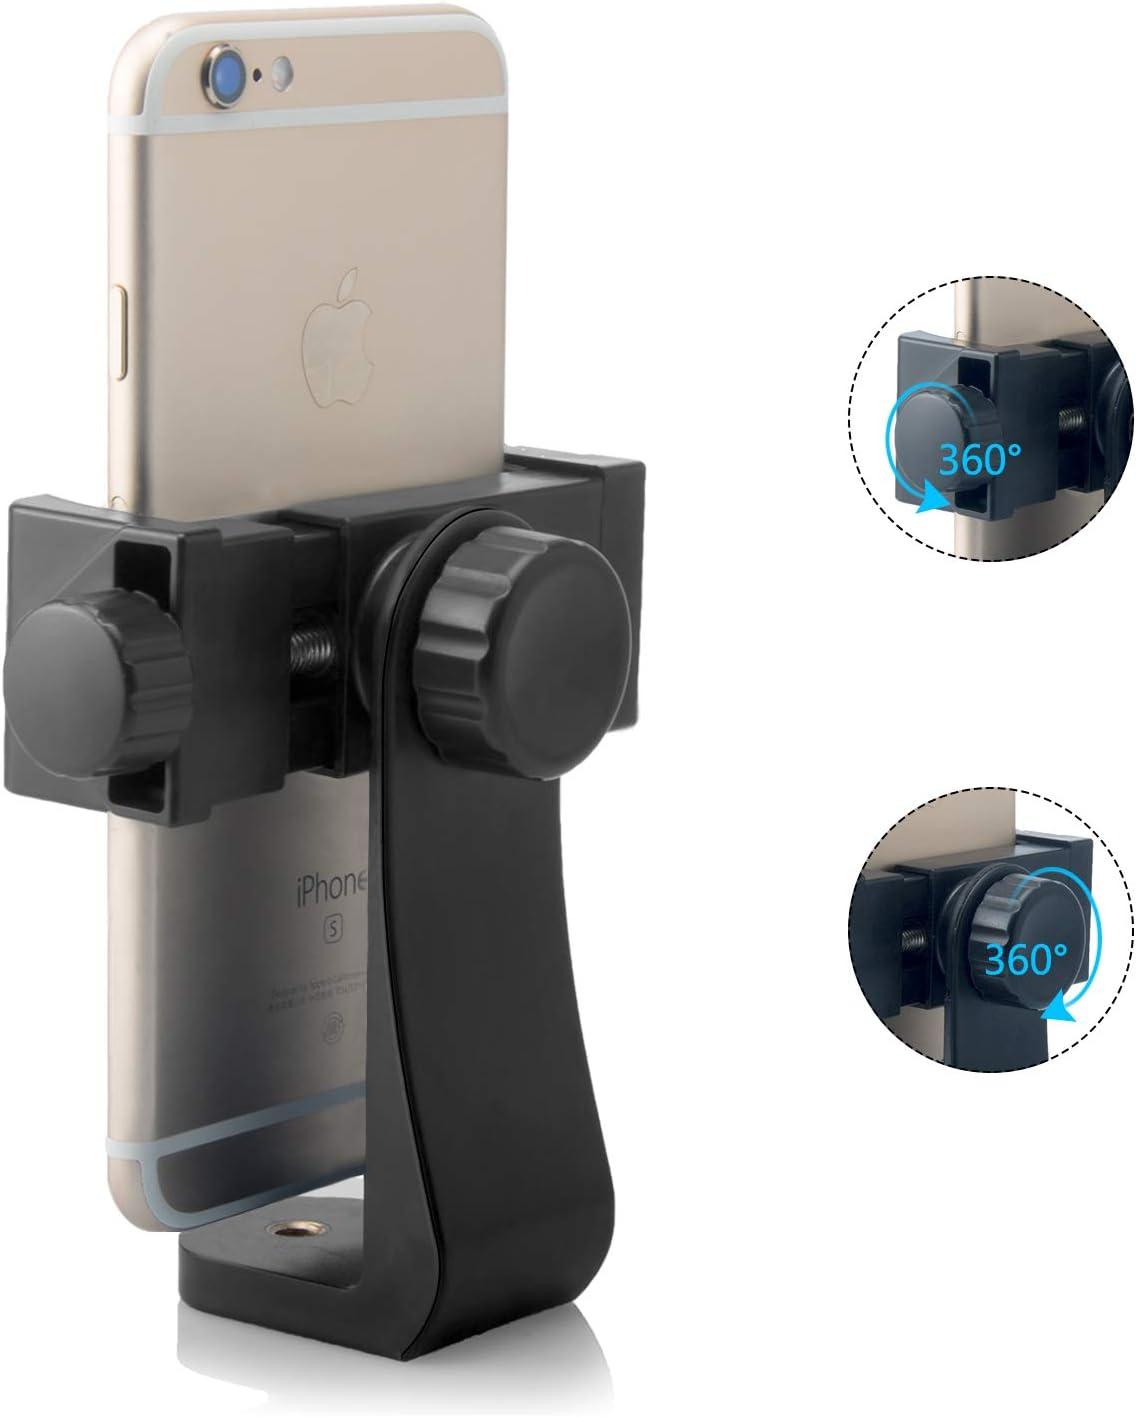 Utilizado en Tr/ípode//Selfie Palo para Fotograf/ía iPhone//Samsung//Nexus Tr/ípode Monopod Selfie Stick Lammcou Smartphone Tr/ípode Adaptador Soporte para Tel/éfono M/óvil Tr/ípode con Abrazadera Ajustable